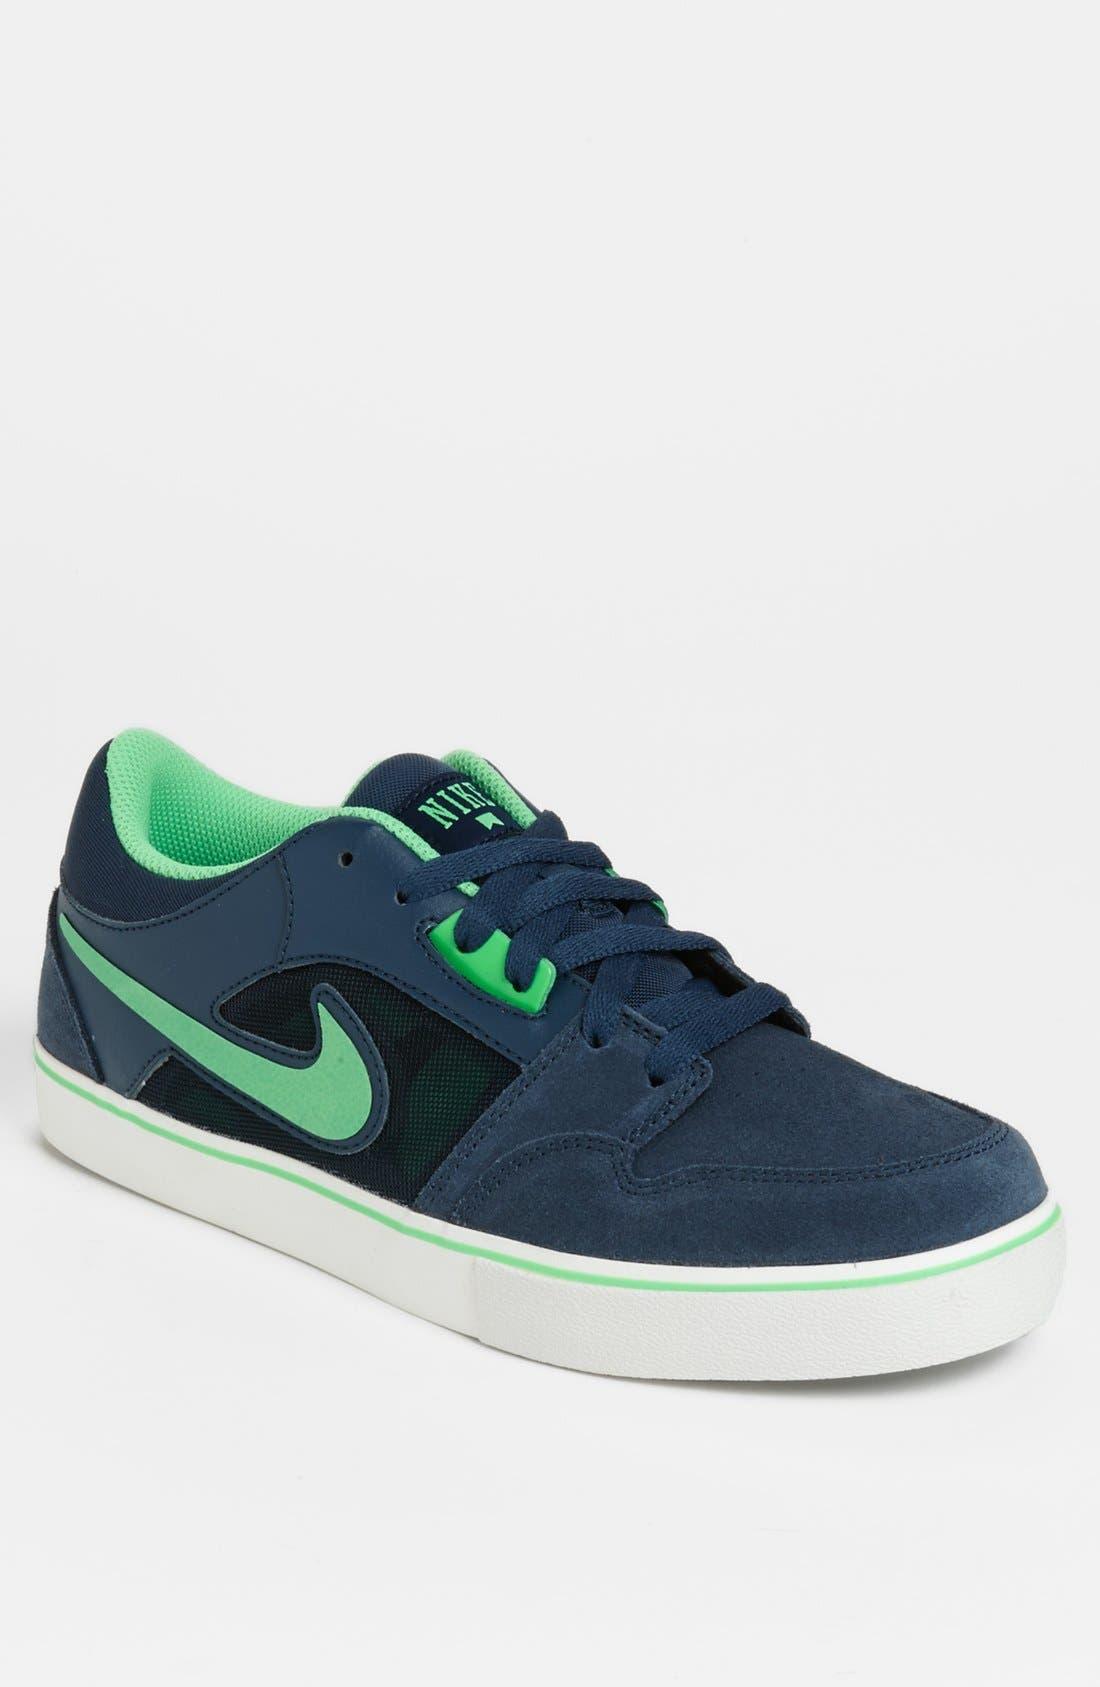 Alternate Image 1 Selected - Nike 'Ruckus 2 LR' Skate Shoe (Men)